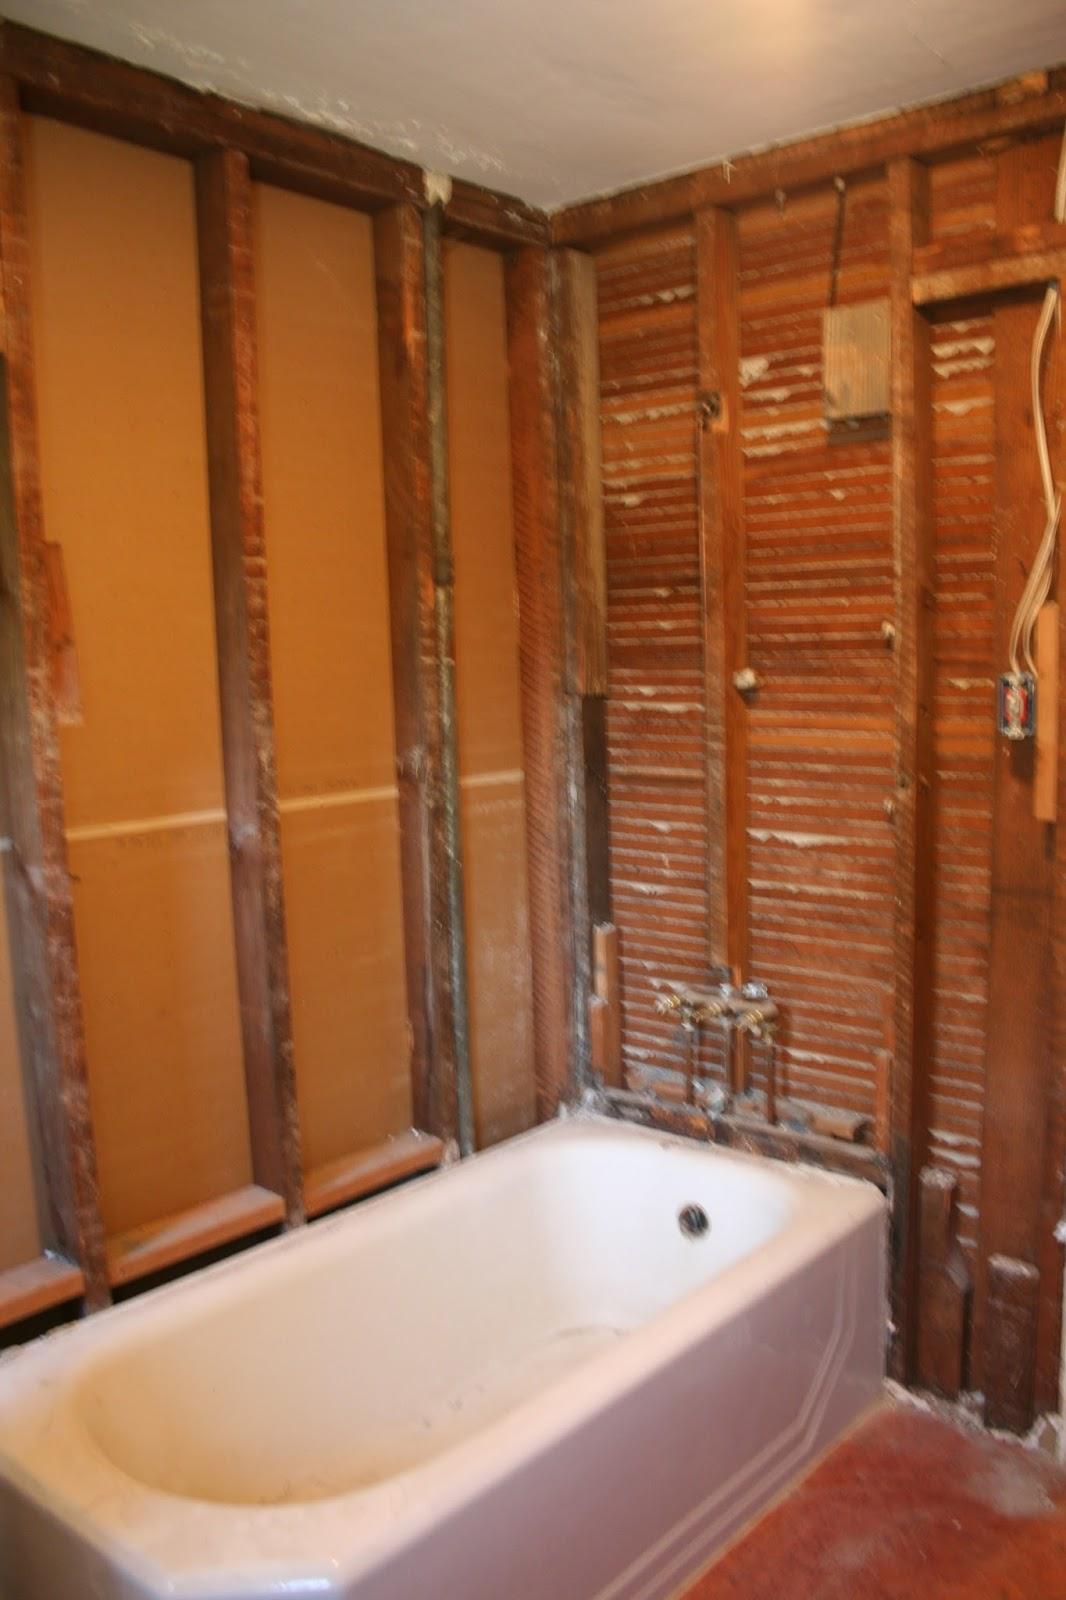 Laurelhurst craftsman bungalow bathroom demo39d for How to demo a bathroom